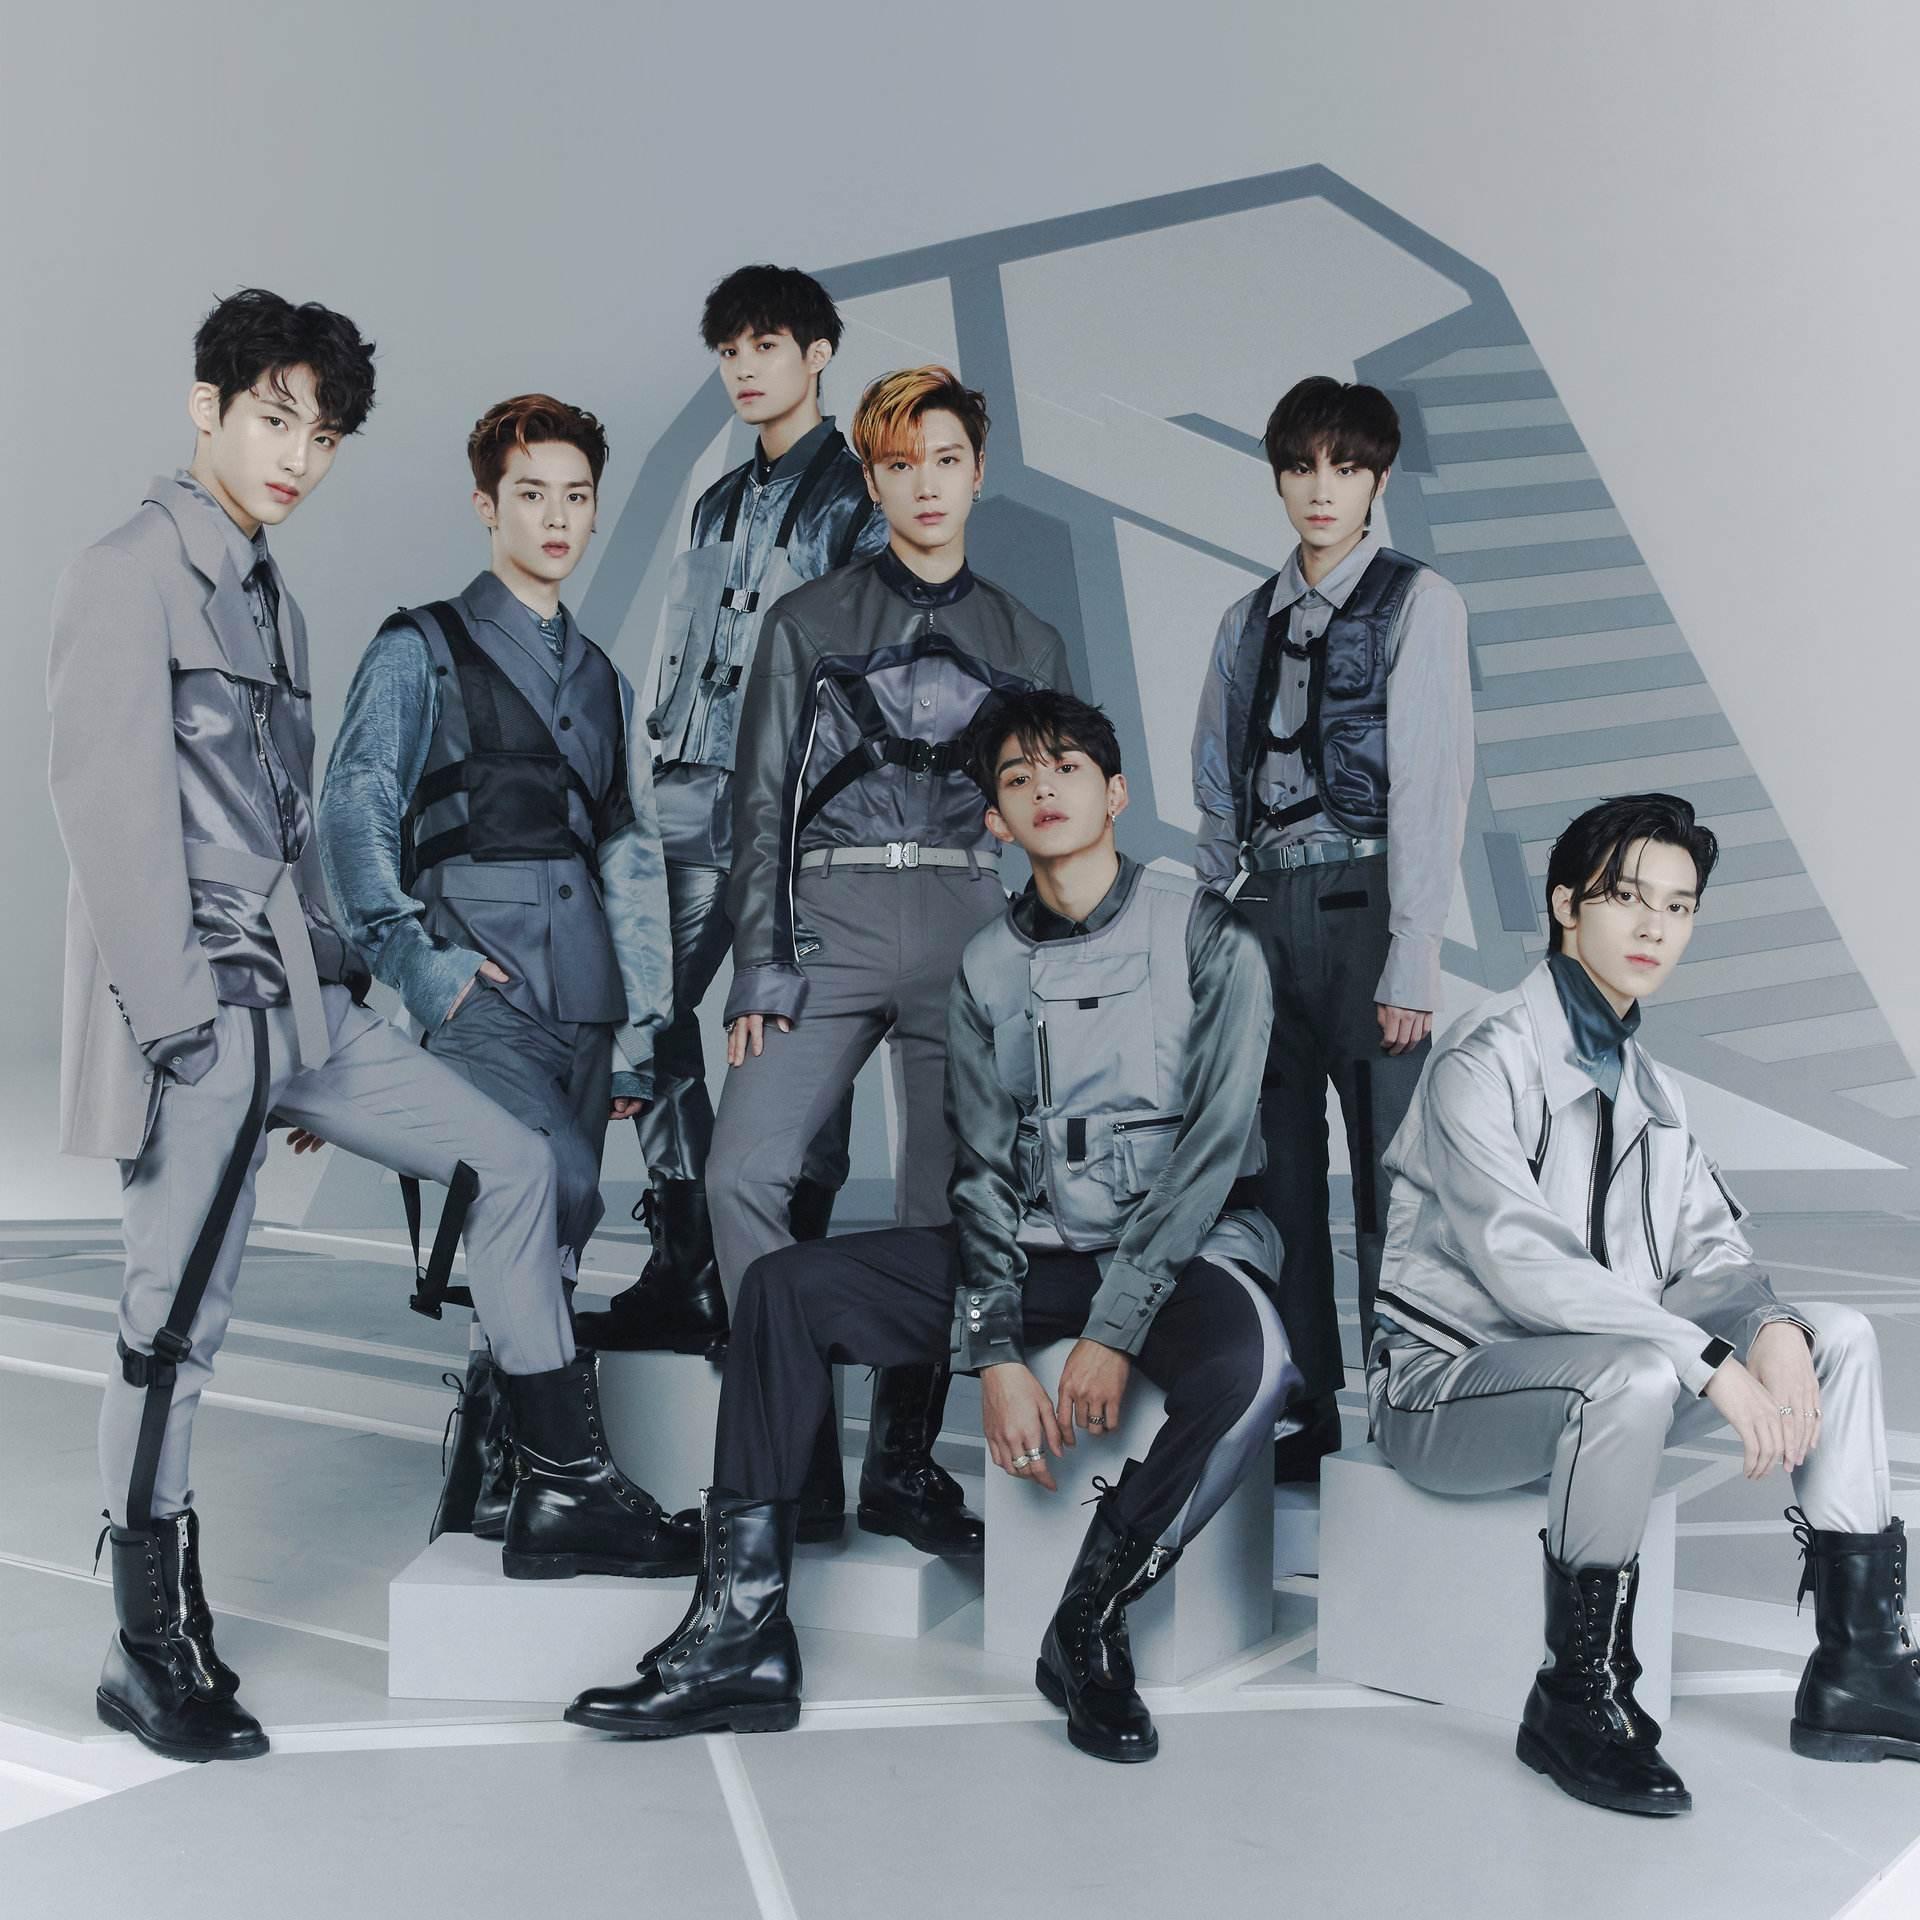 Tumblr公布2020最受欢迎韩国偶像TOP100,防弹少年团再次包揽前7插图9